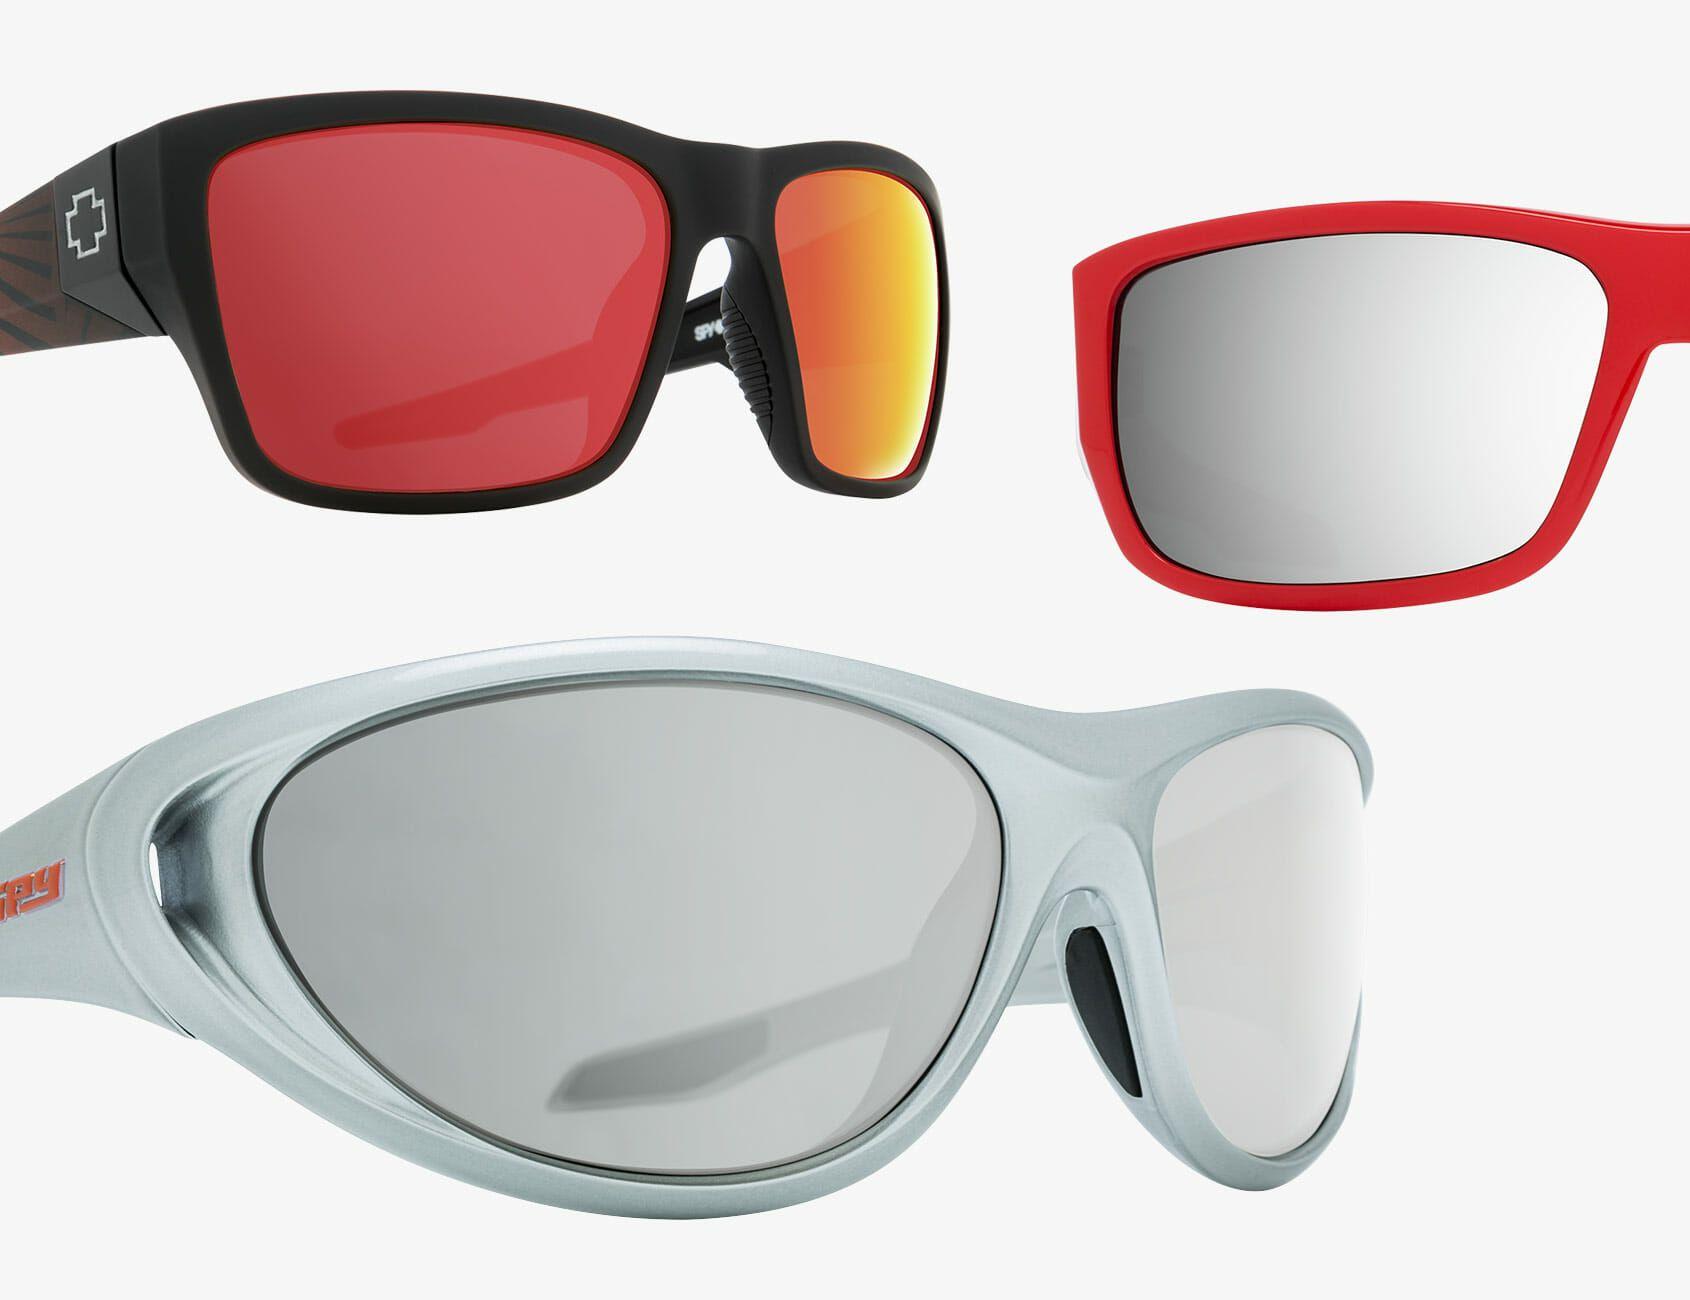 Spy Optics Celebrates 25 Years With Three Retro Sunglasses